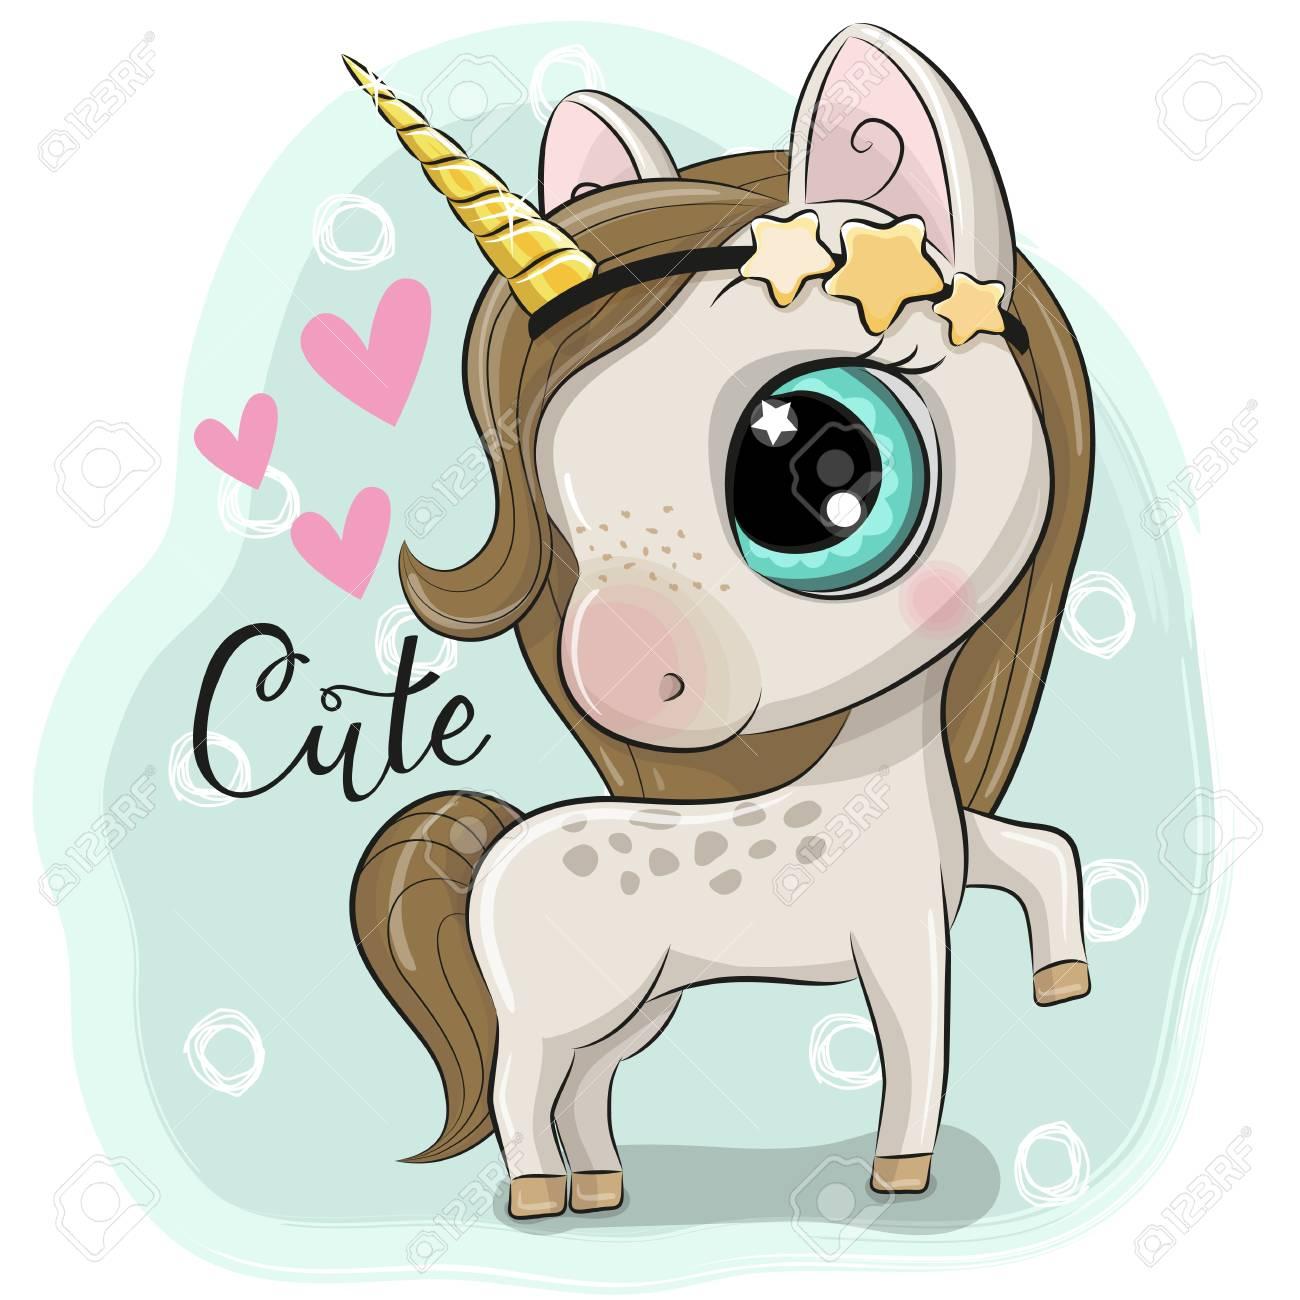 Cute Cartoon Unicorn on a blue background - 110237370